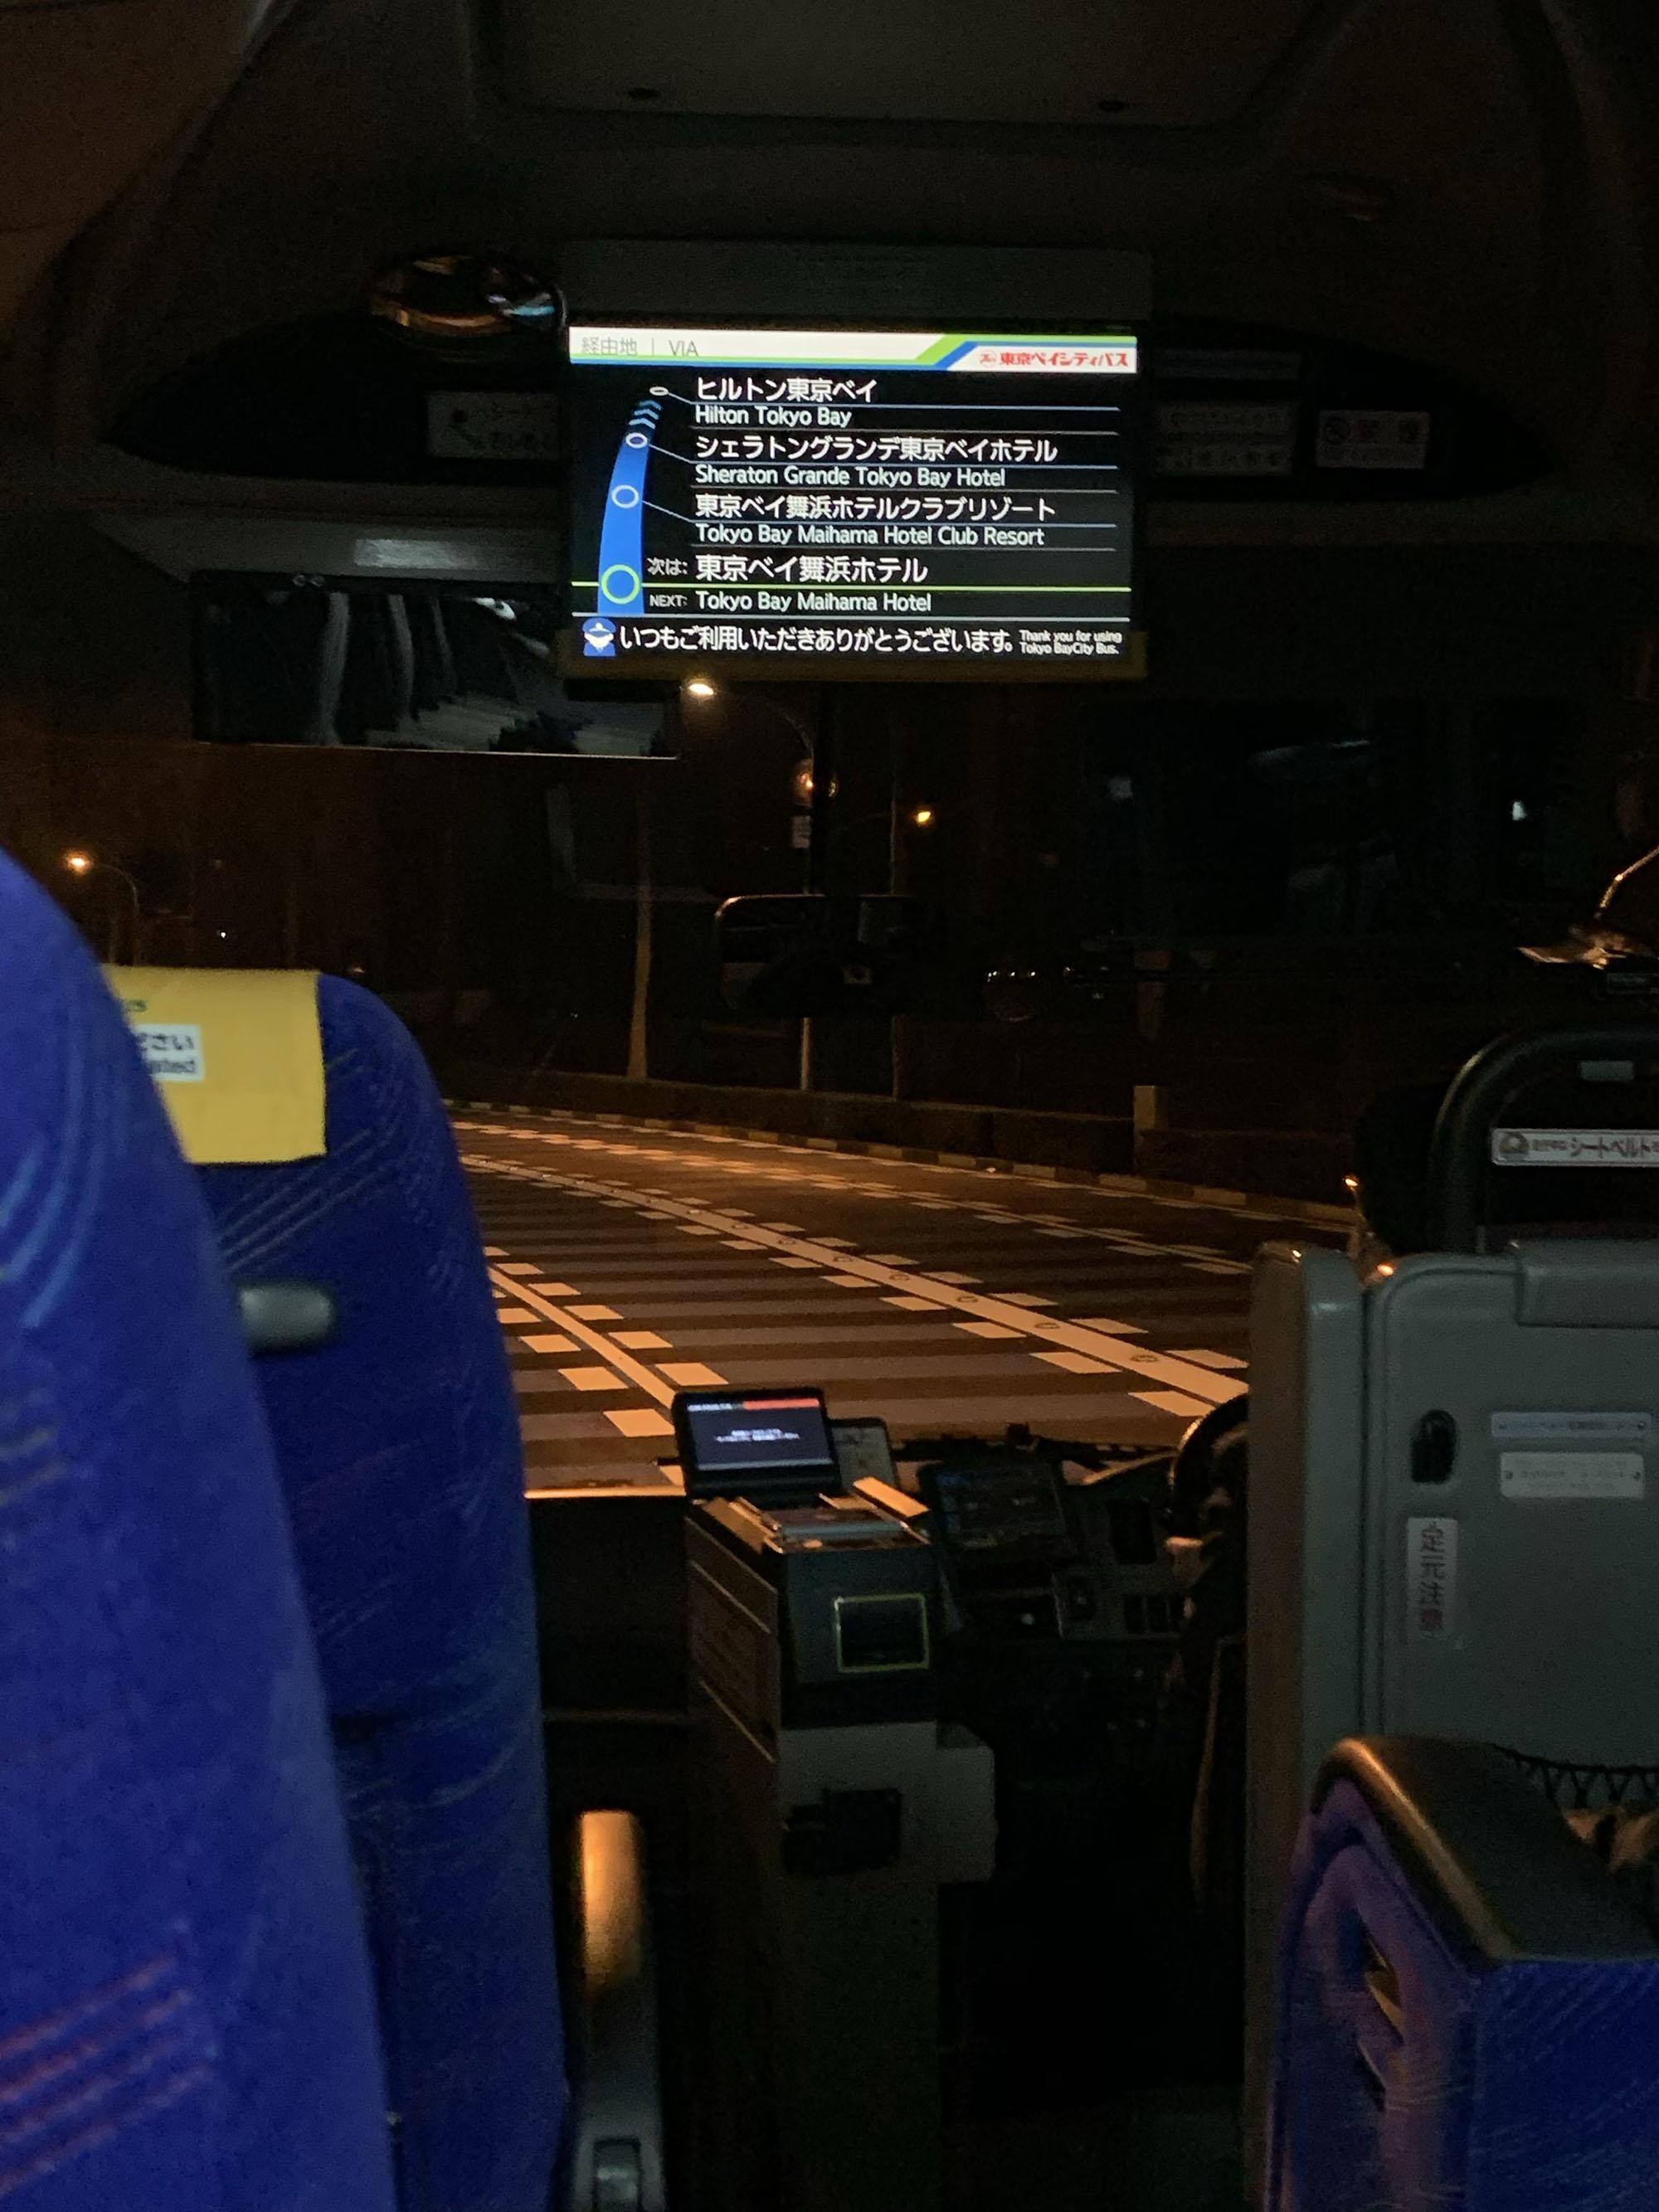 Airport Limousine to Tokyo Disney